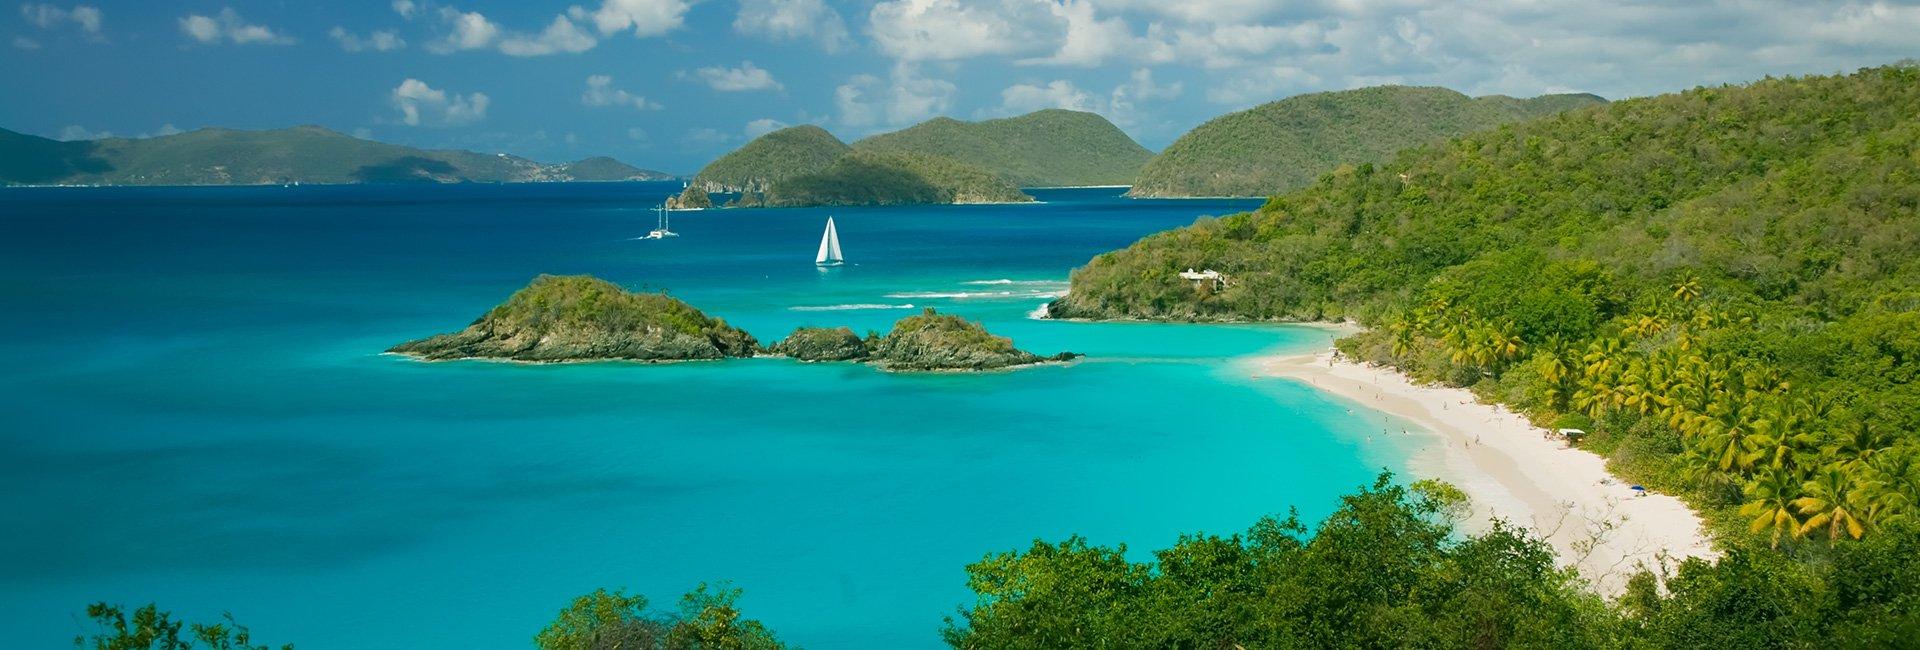 The Caribbean sailing destination